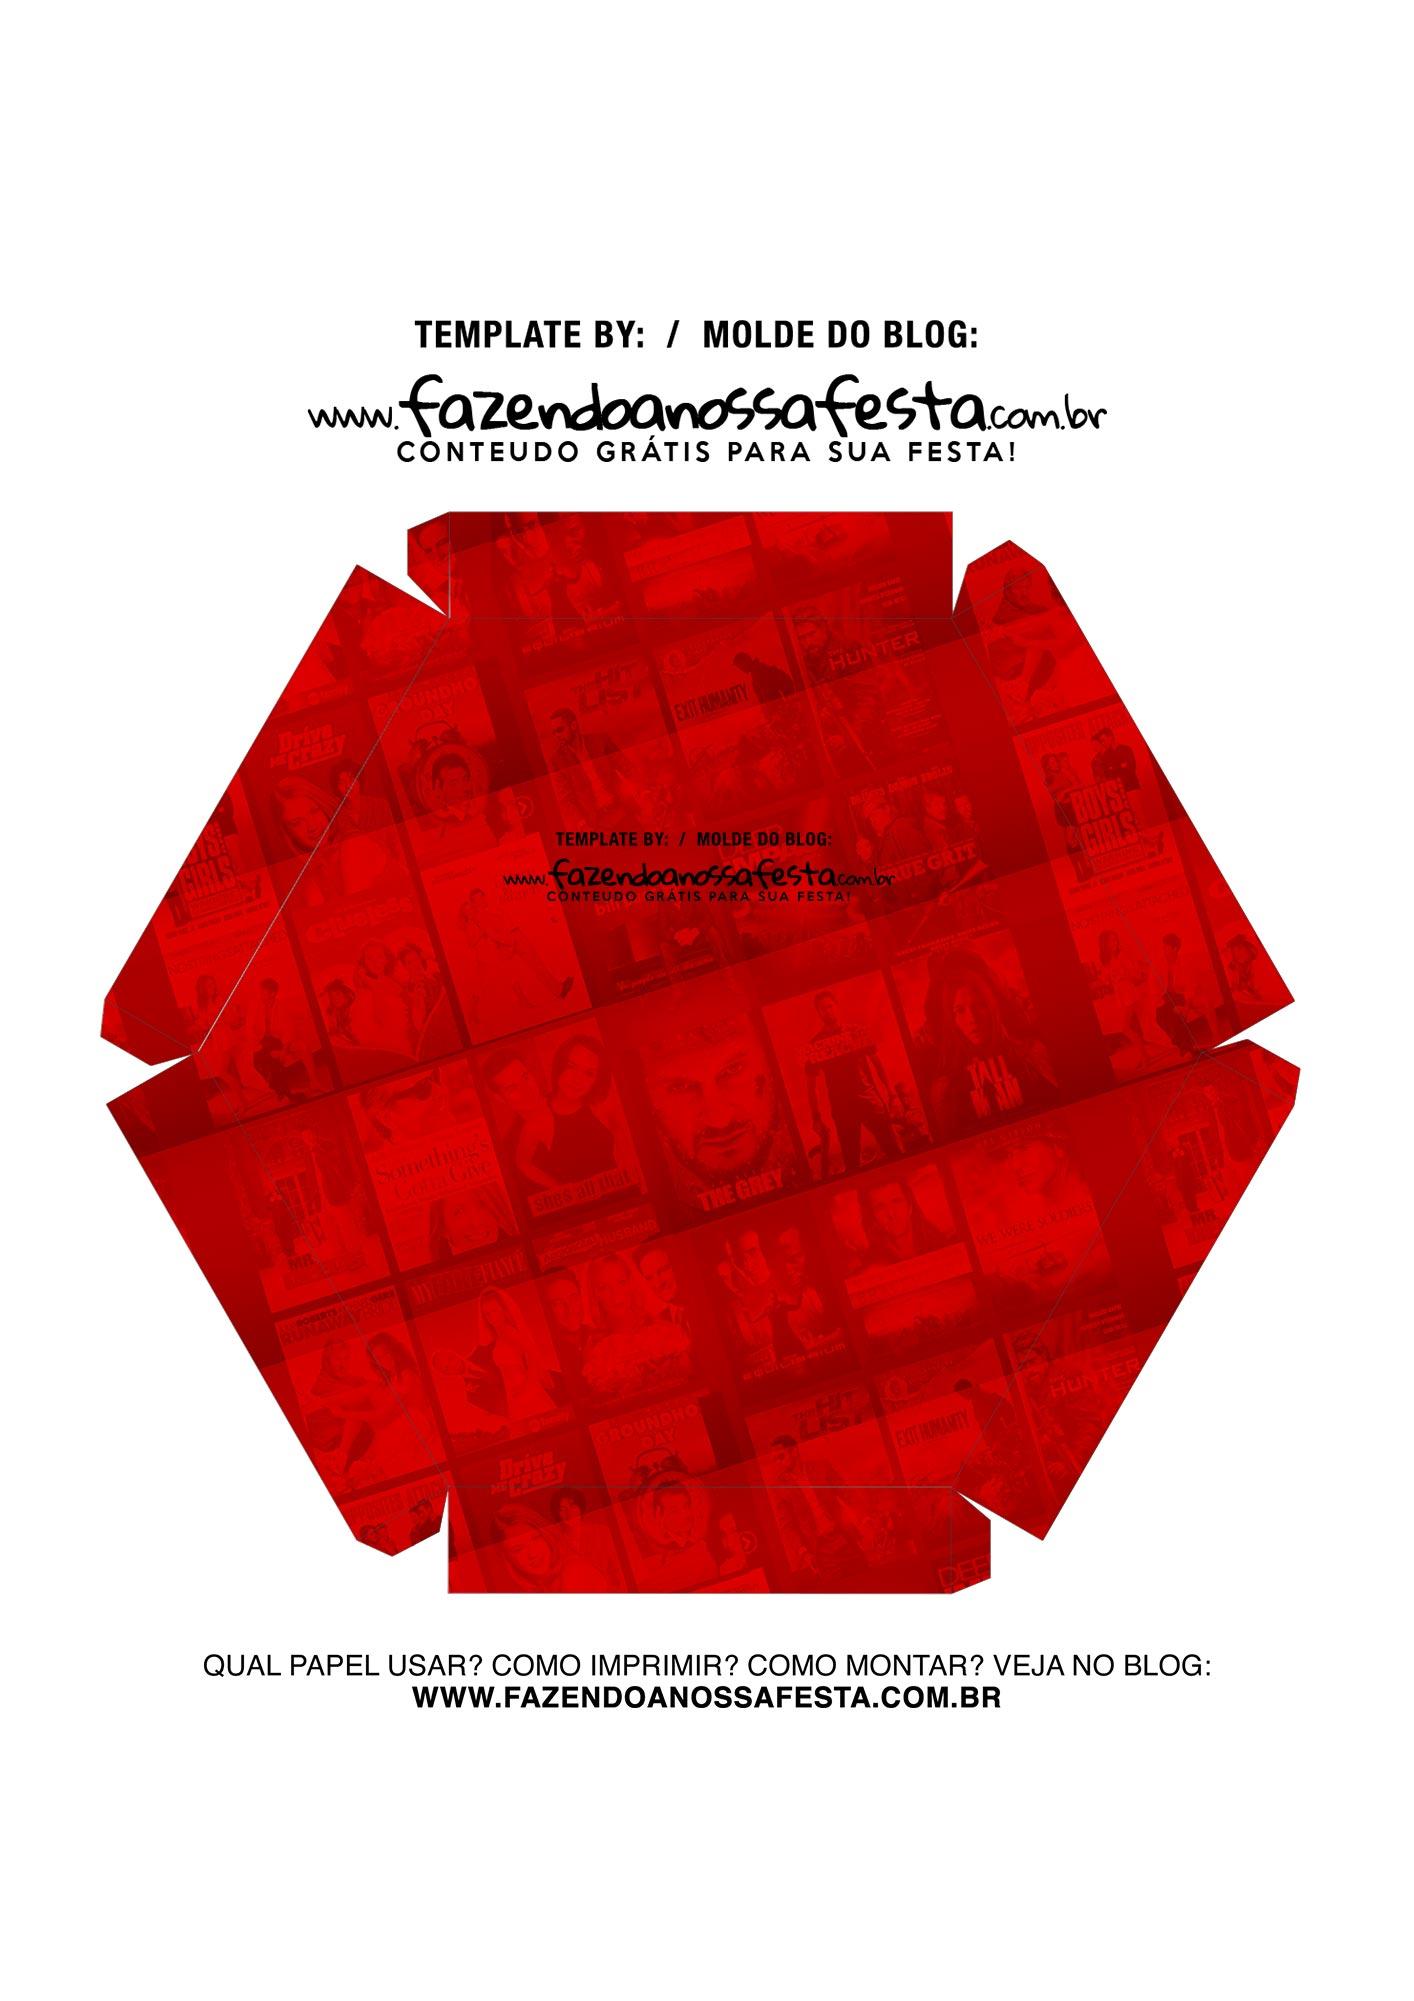 Caixa Explosiva Dia dos Namorados Netflix 8